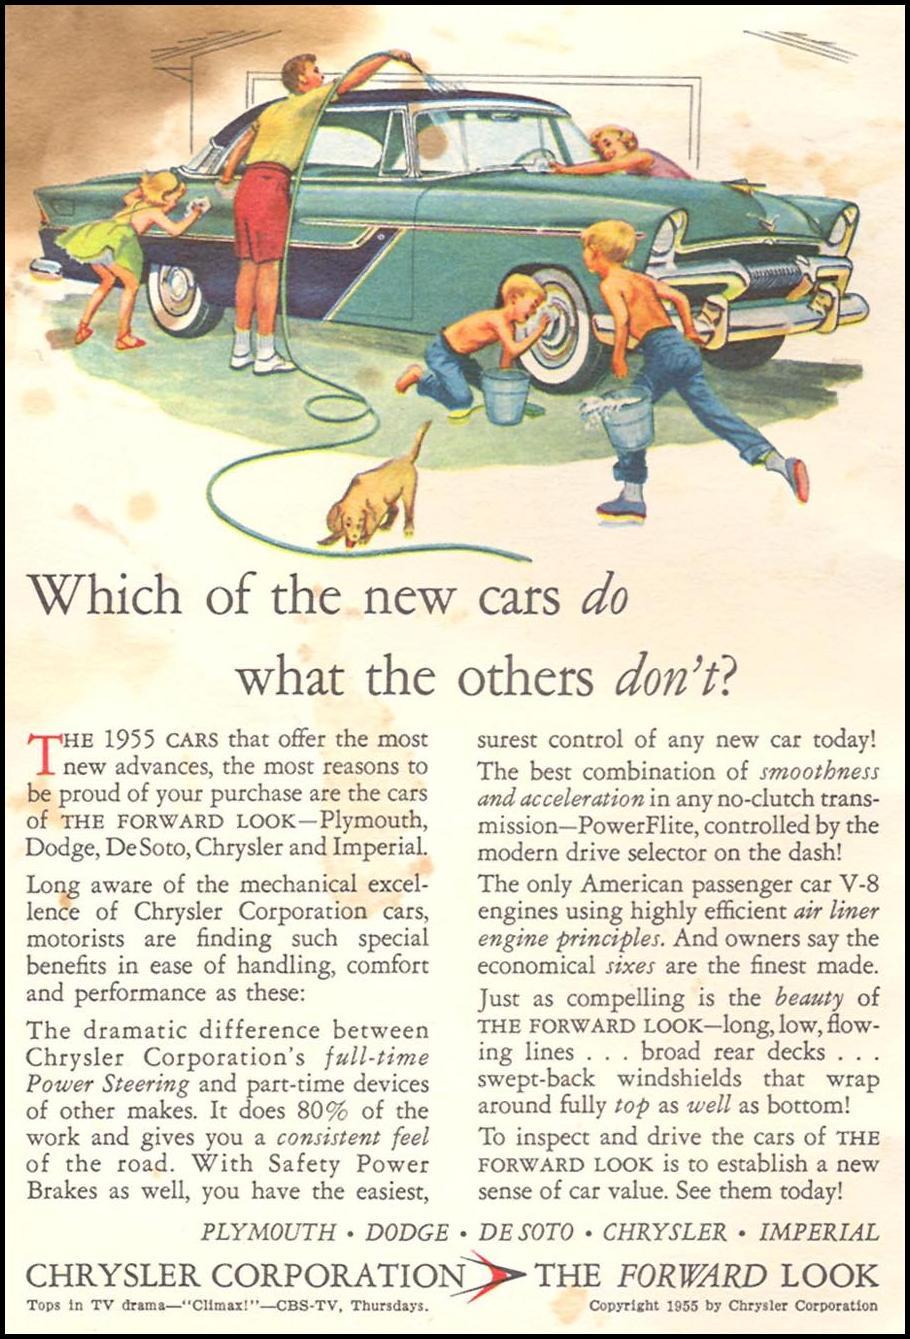 CHRYSLER AUTOMOBILES CORONET 08/01/1955 INSIDE FRONT